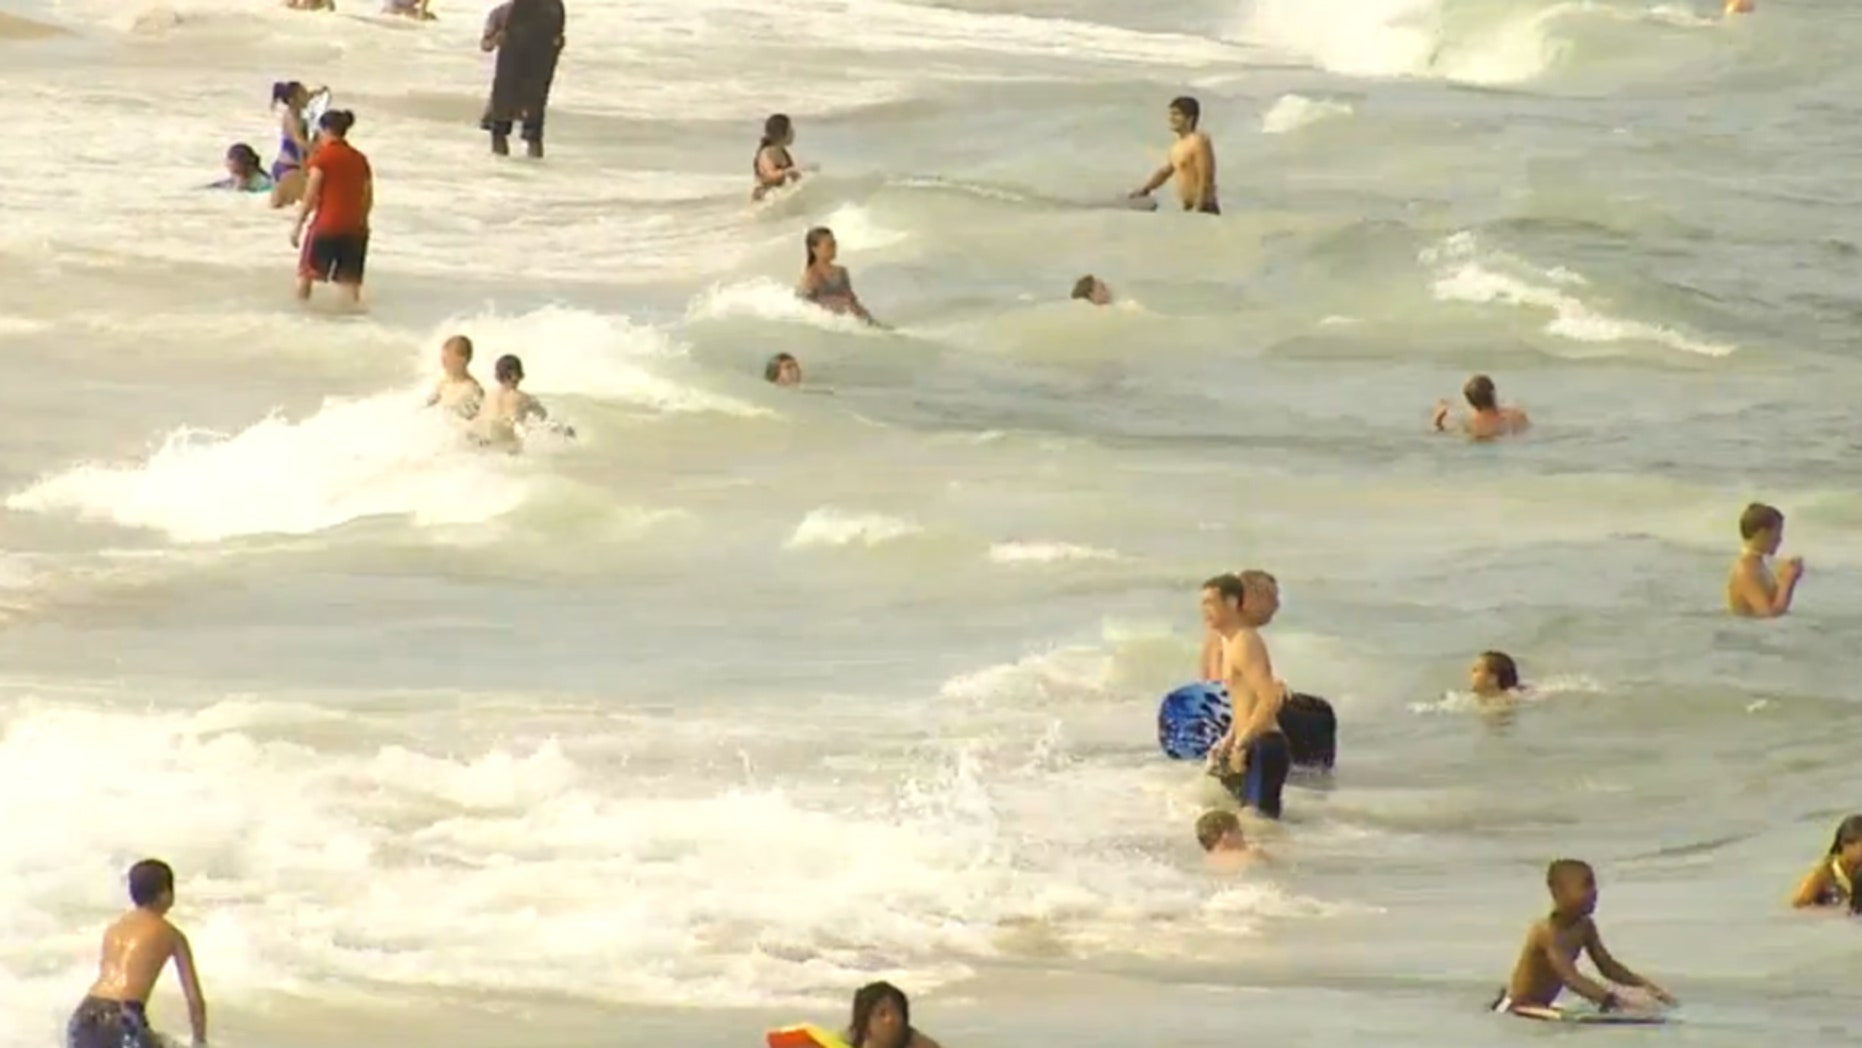 Swimmers in the ocean in Ocean City, Maryland.